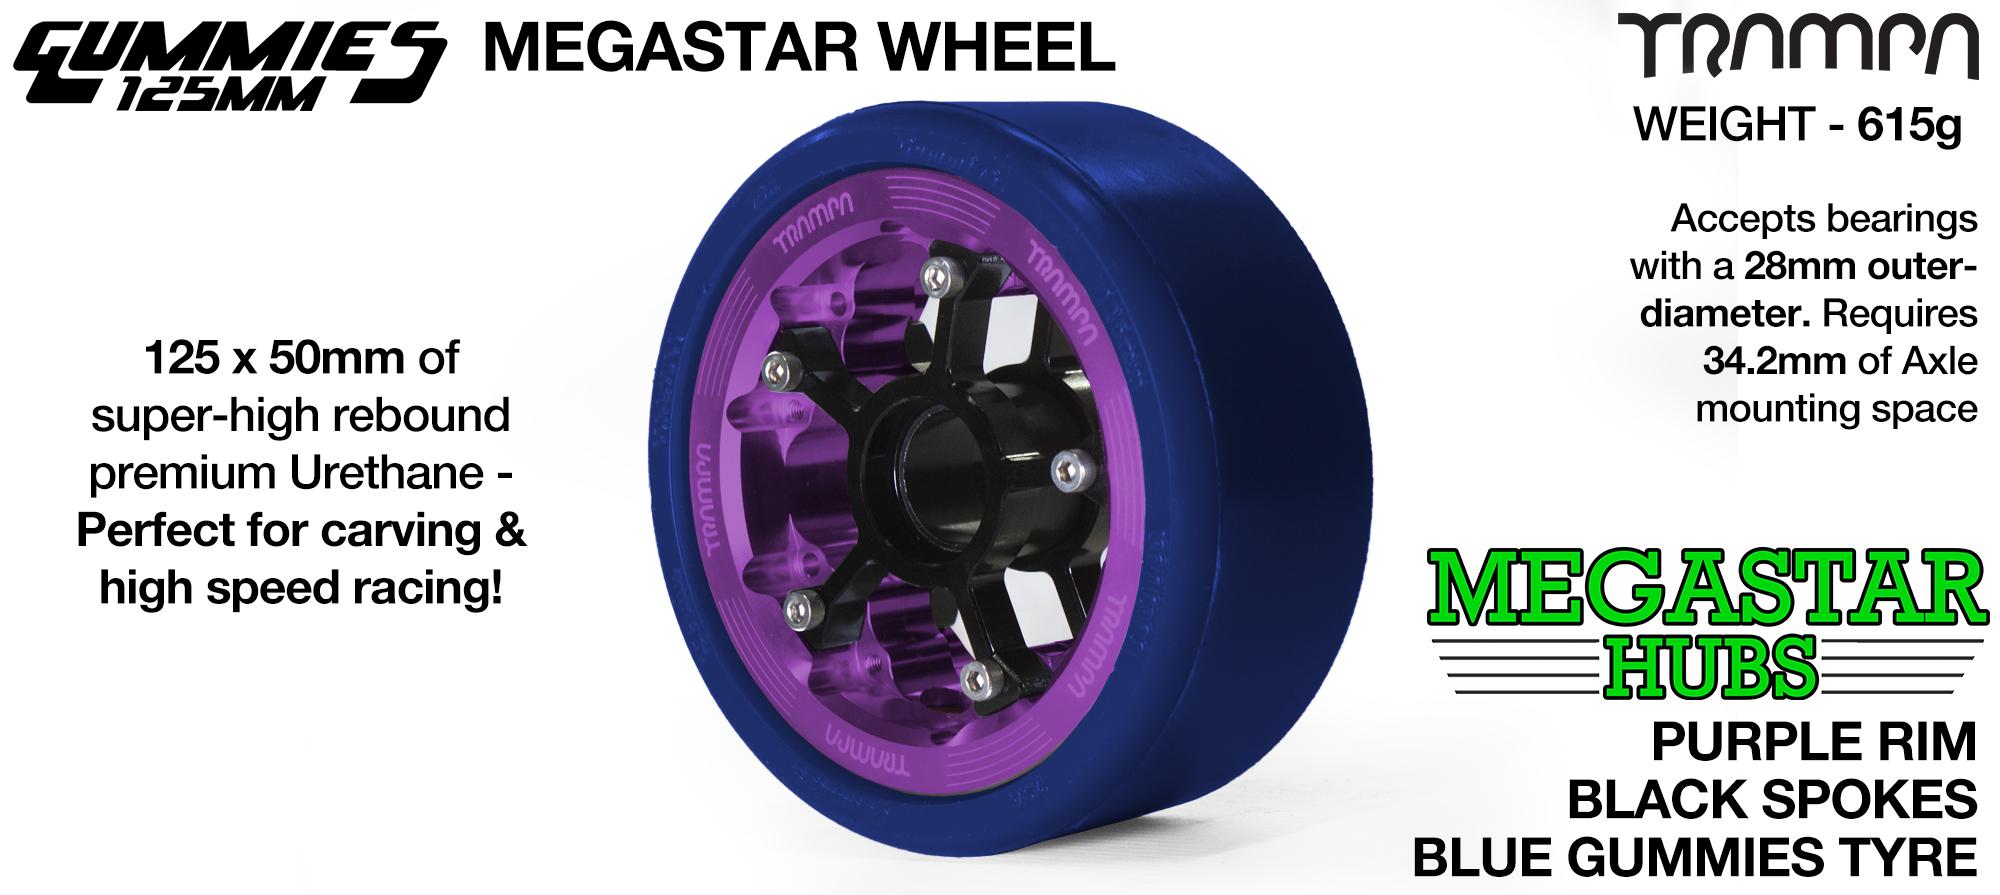 PURPLE MEGASTAR Rim with BLACK Spokes & BLUE Gummies  - The Ulrimate Longboard Wheel